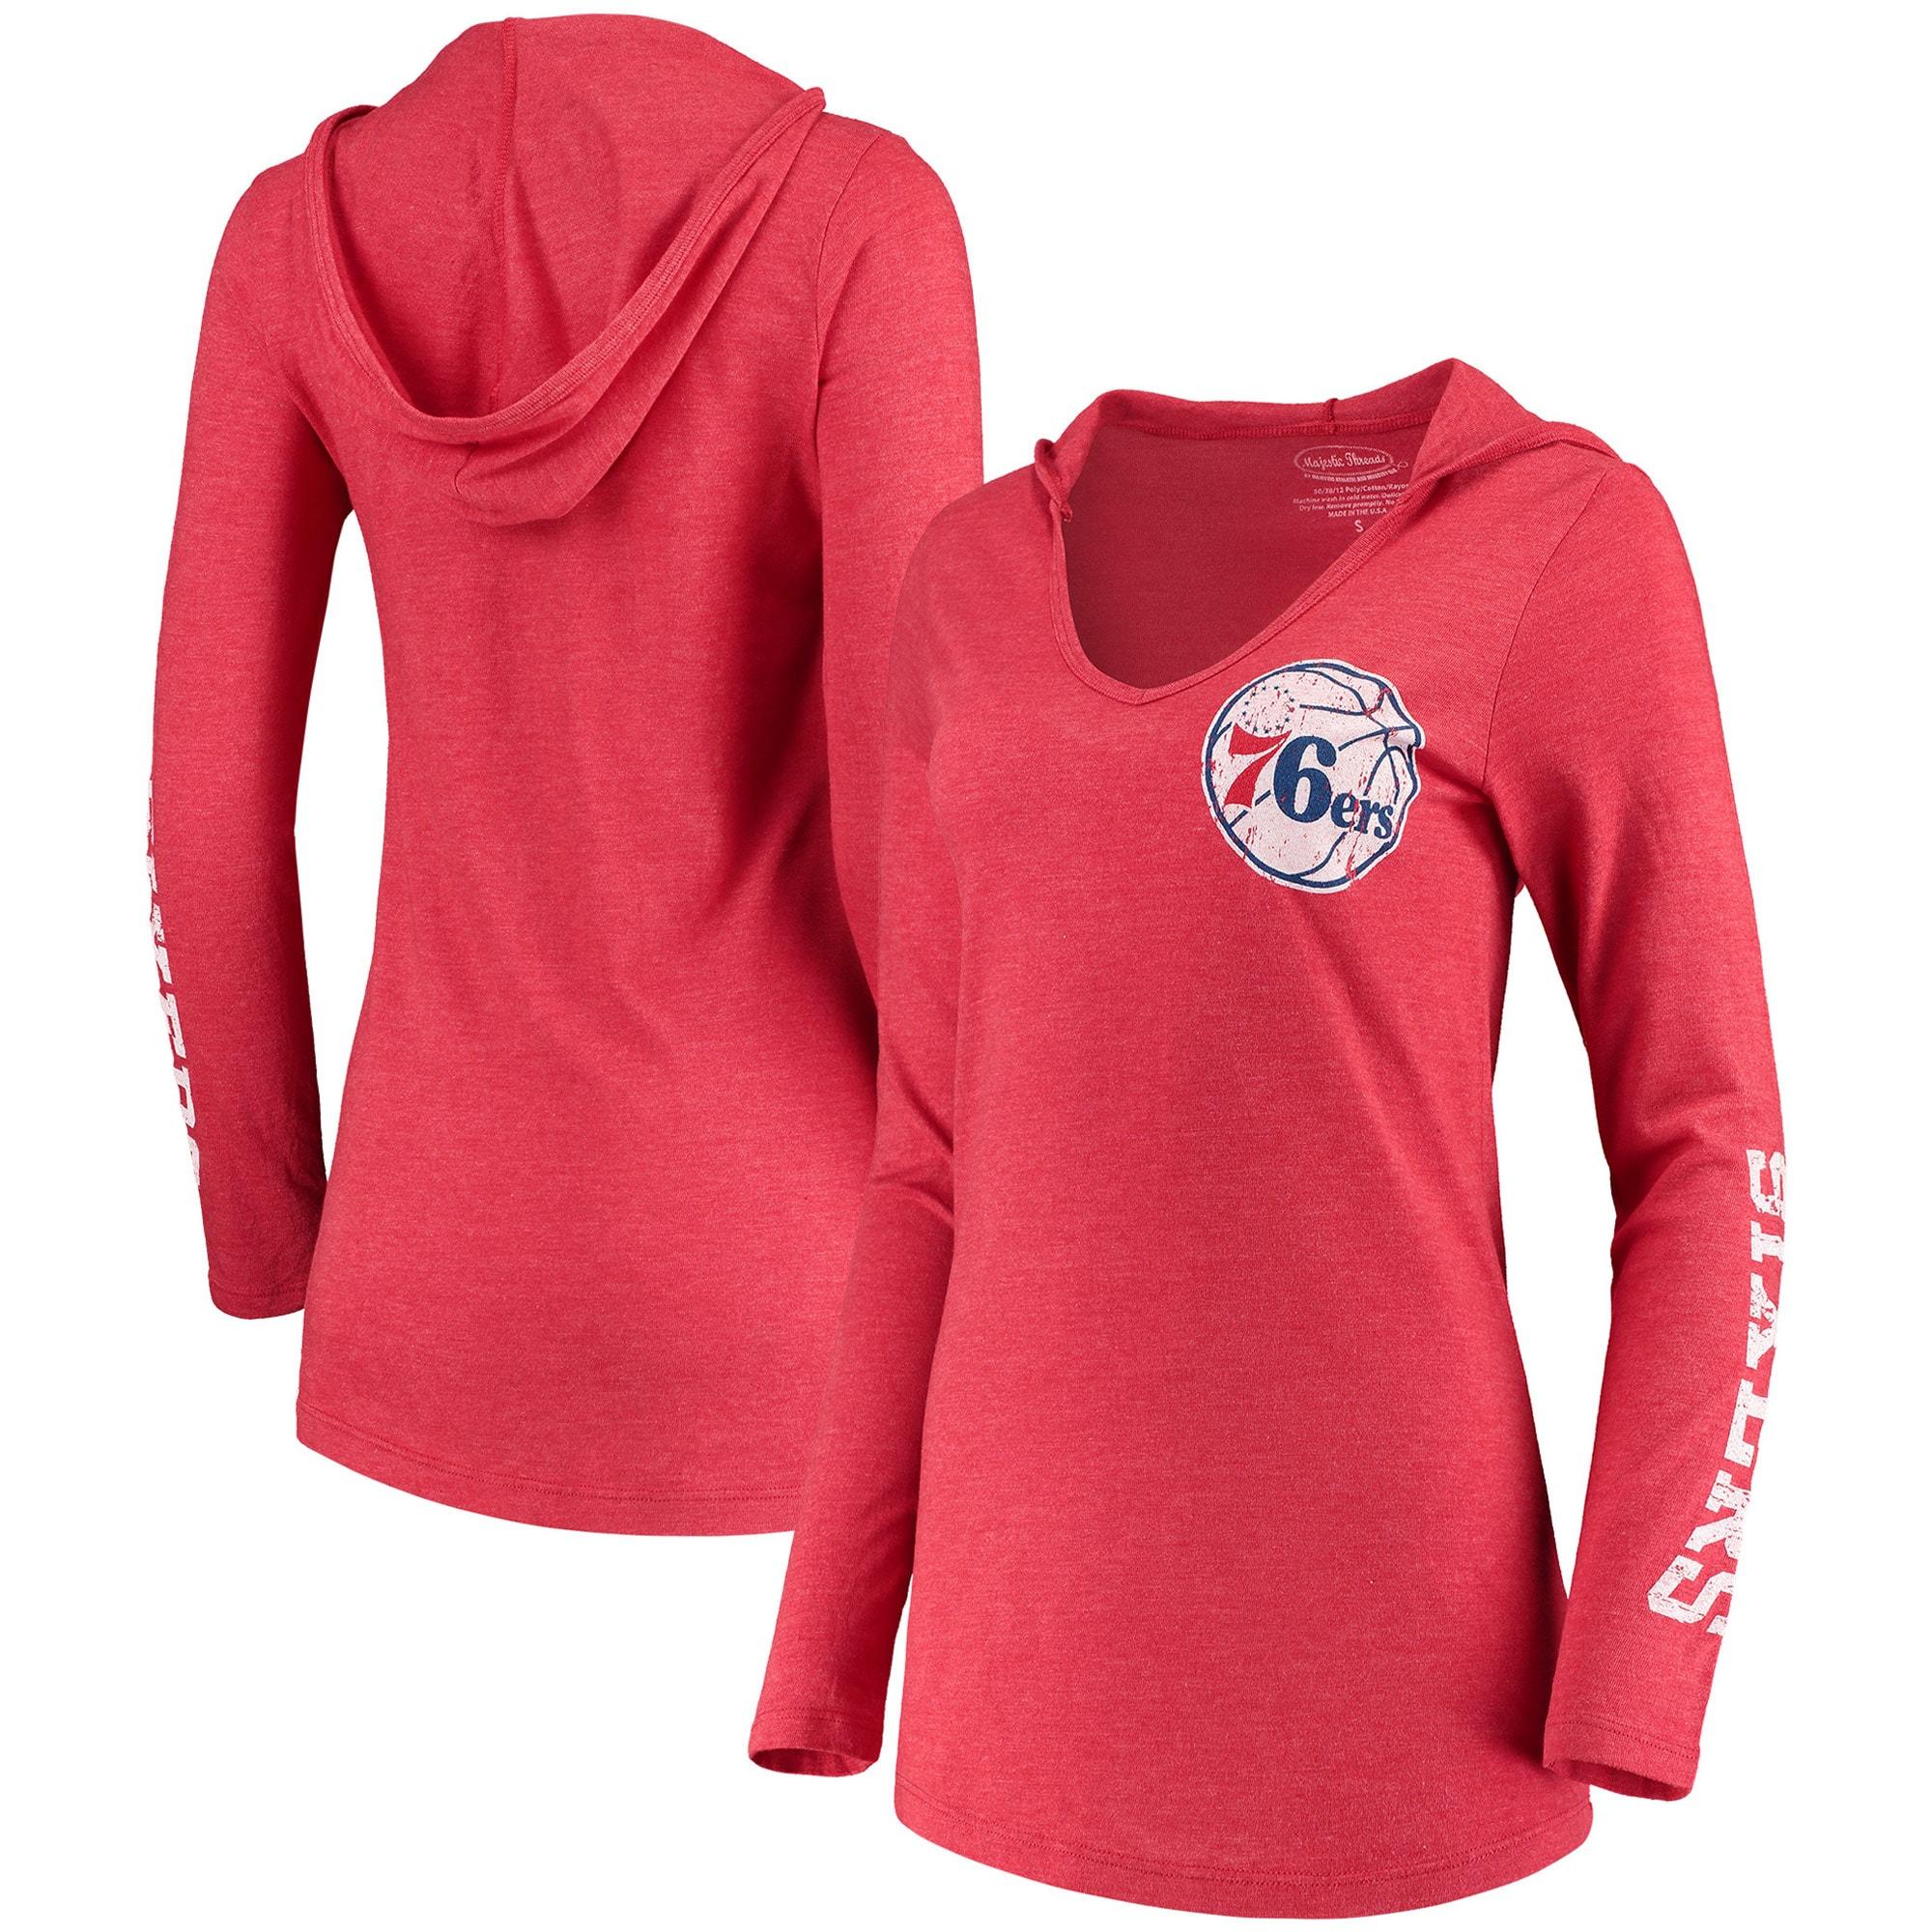 Philadelphia 76ers Majestic Threads Women's Tri-Blend V-Neck Pullover Hoodie - Red